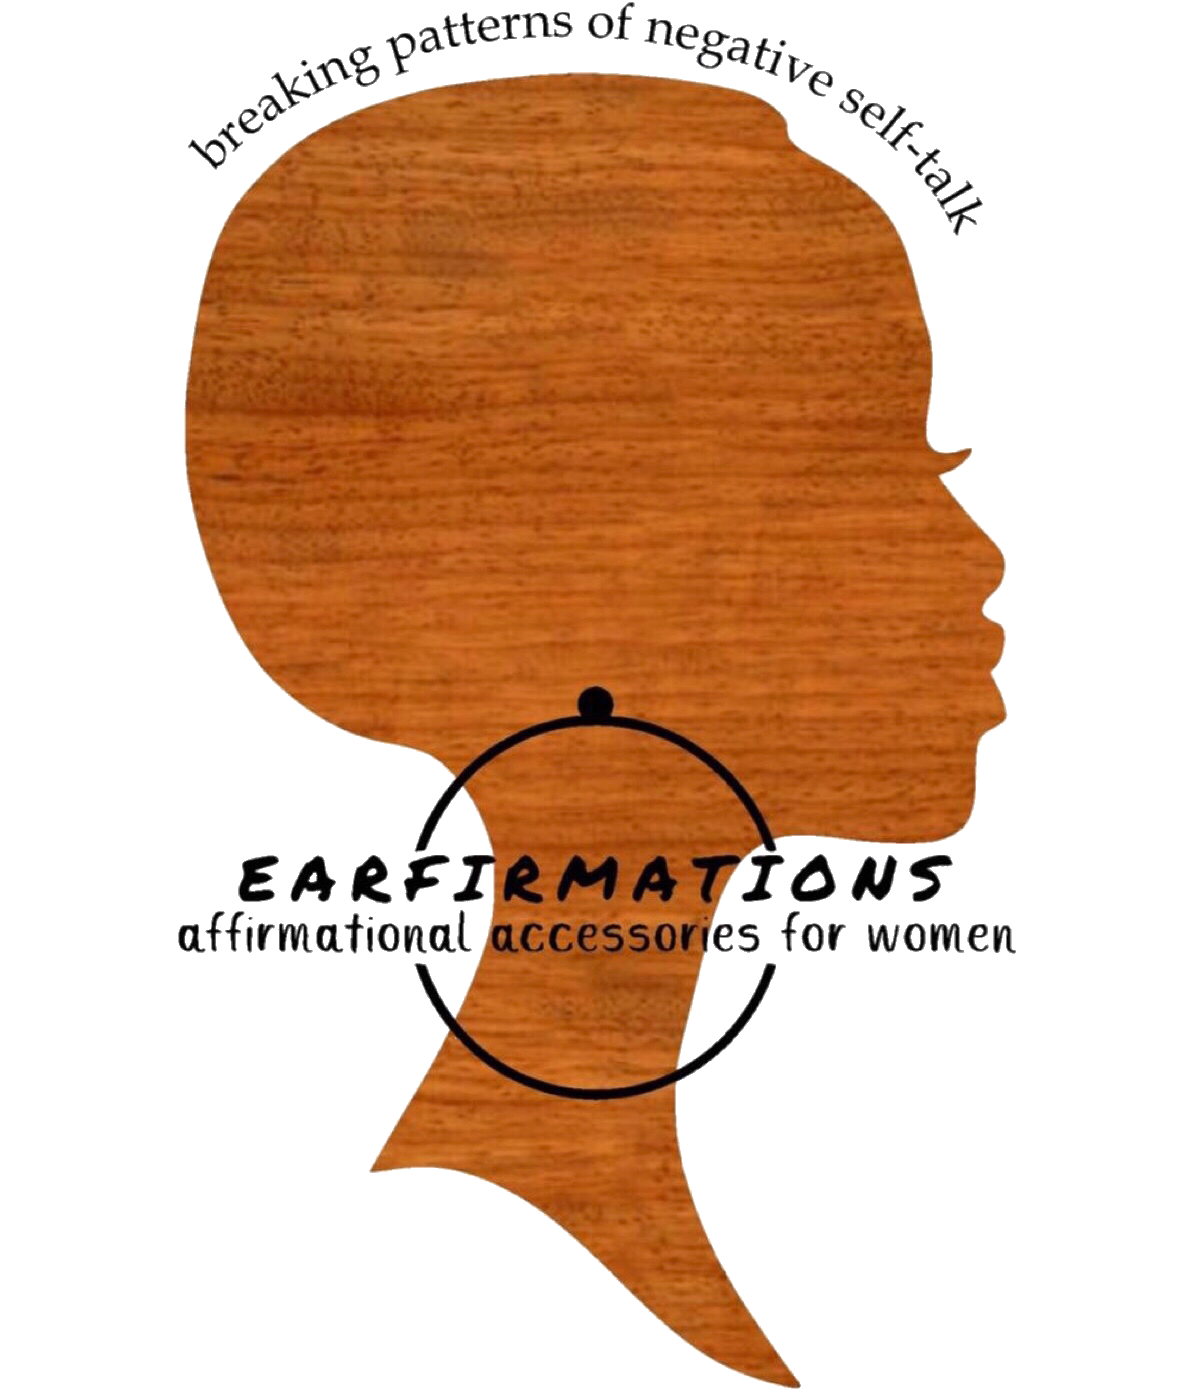 Queens Don't Quit logo